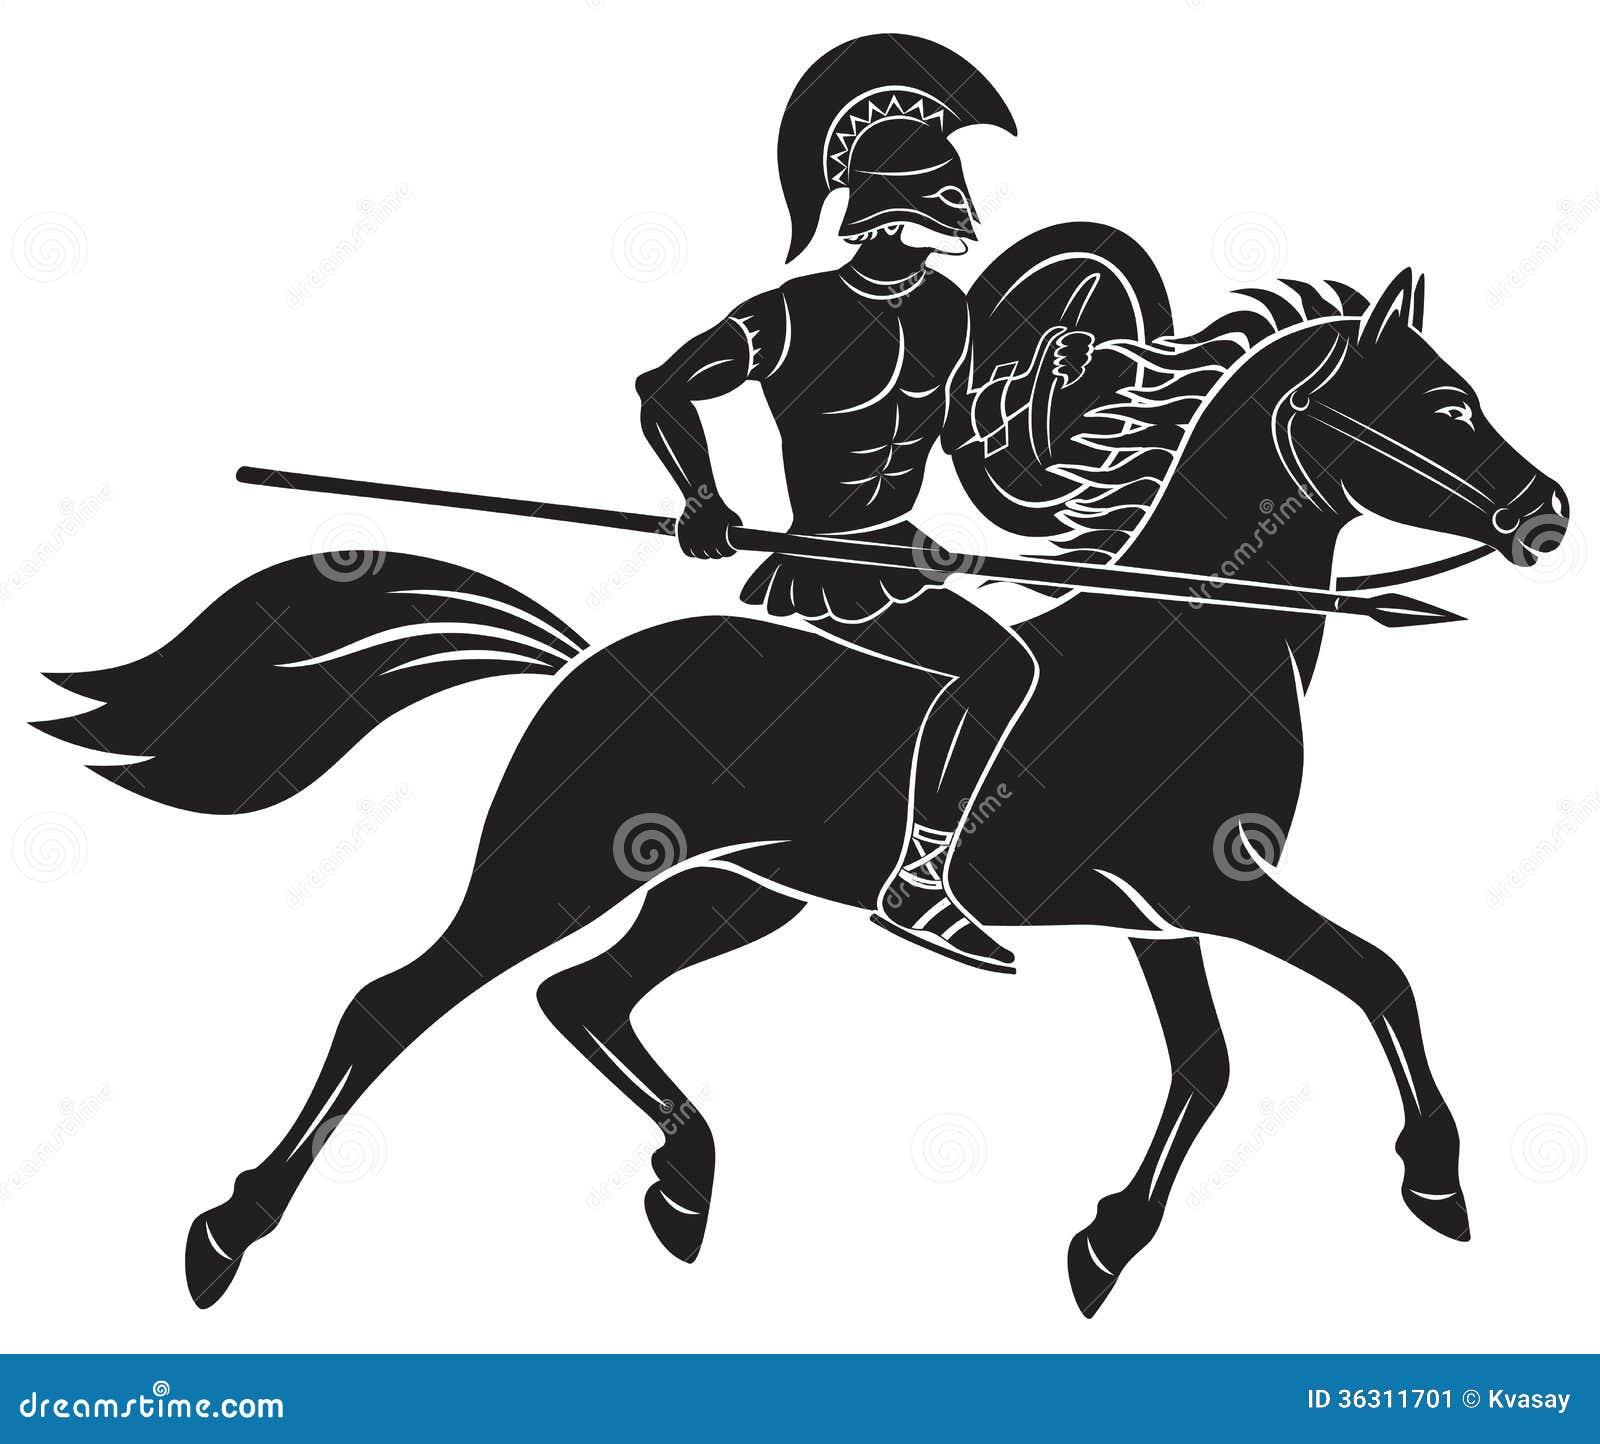 Warriors New Stadium Seat License: Gladiator Stock Image